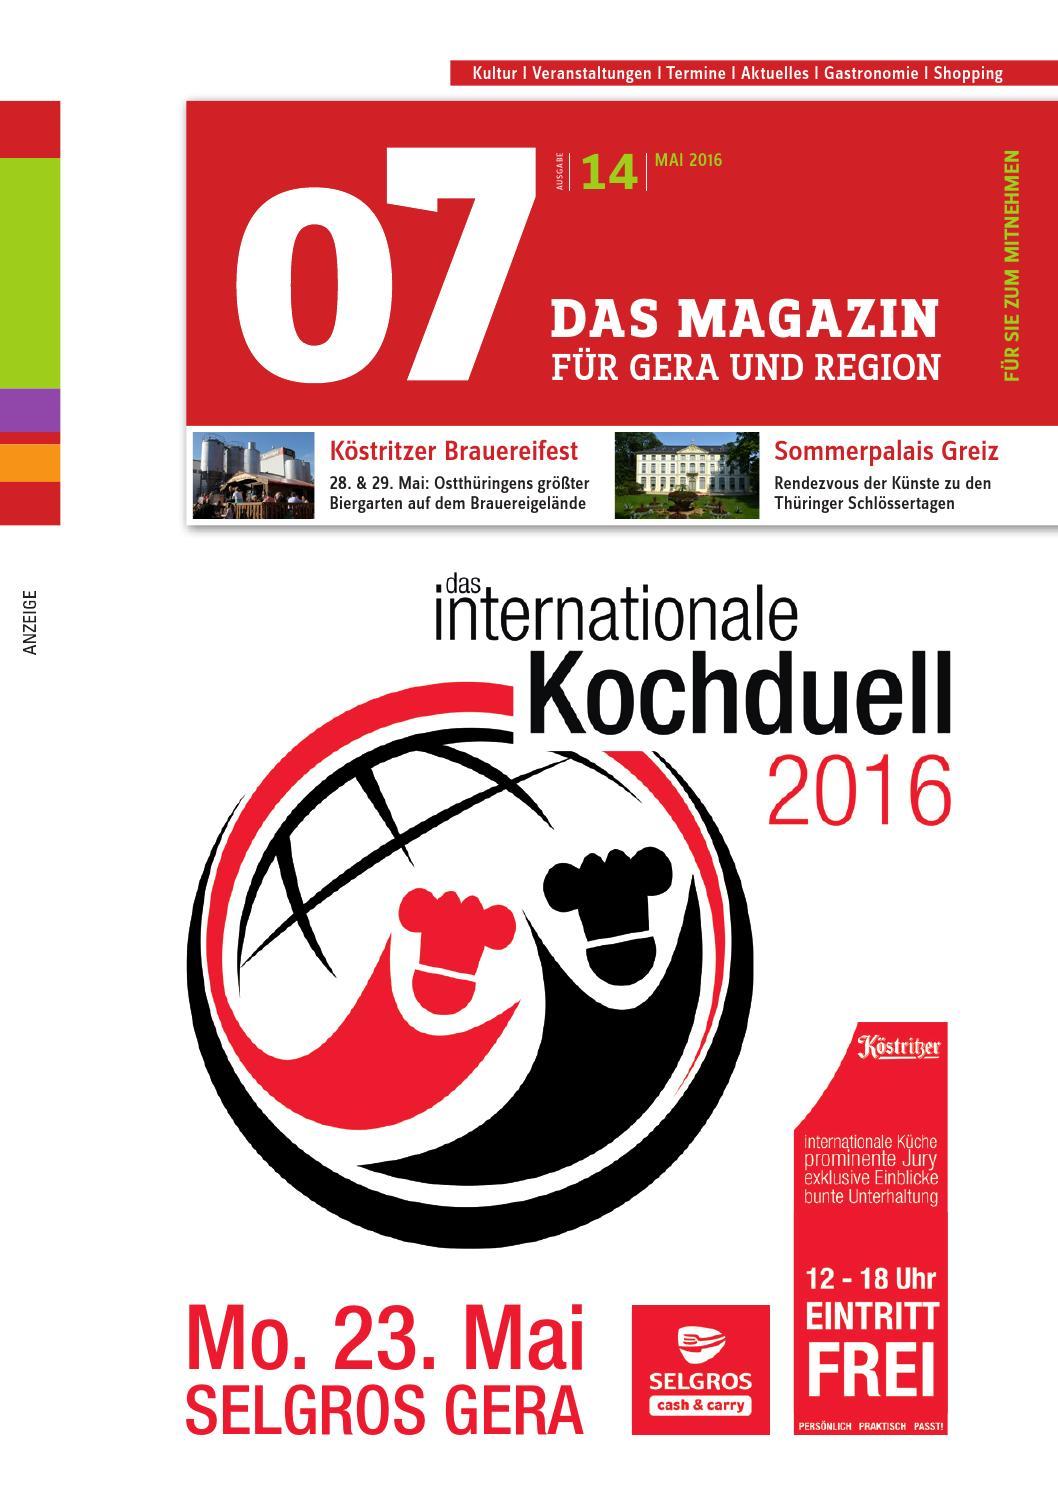 07 Das Magazin Gera & Region, Ausgabe 14, Mai 2016 by 07 & tam.tam ...